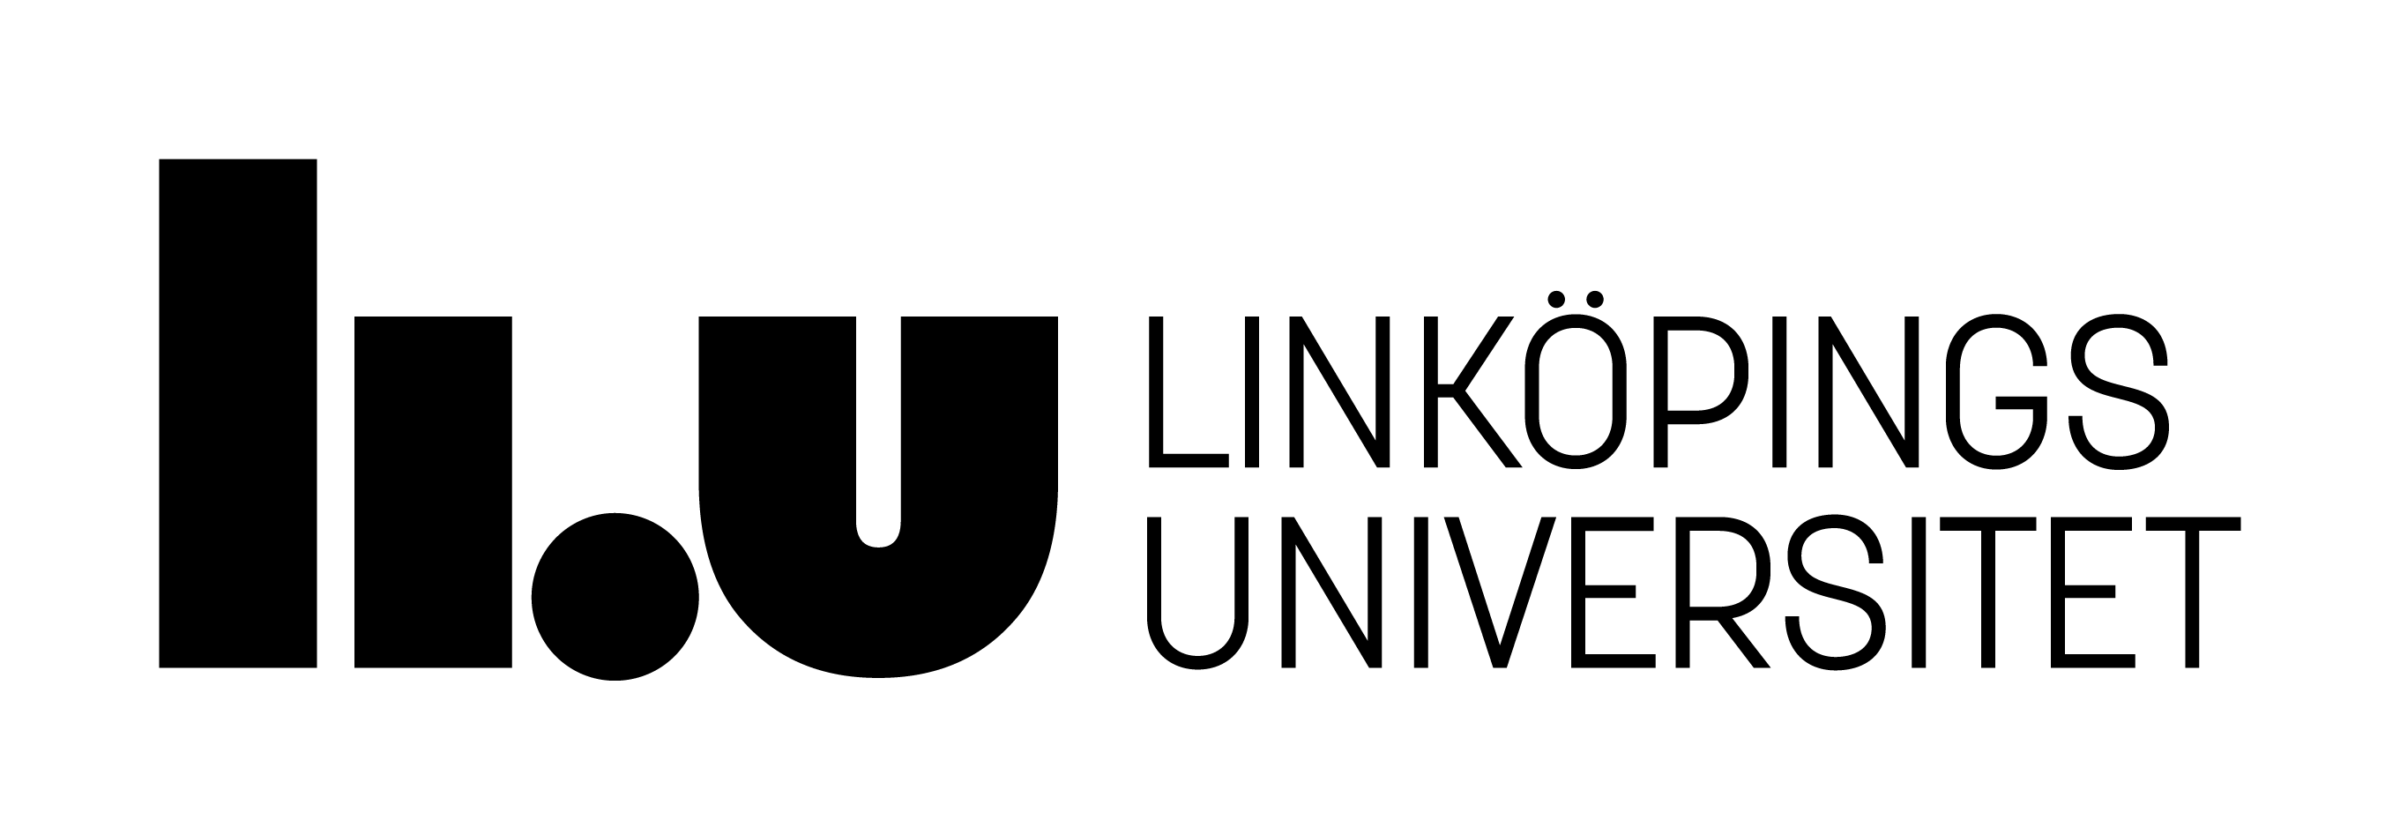 LiU-primar-svart-logo